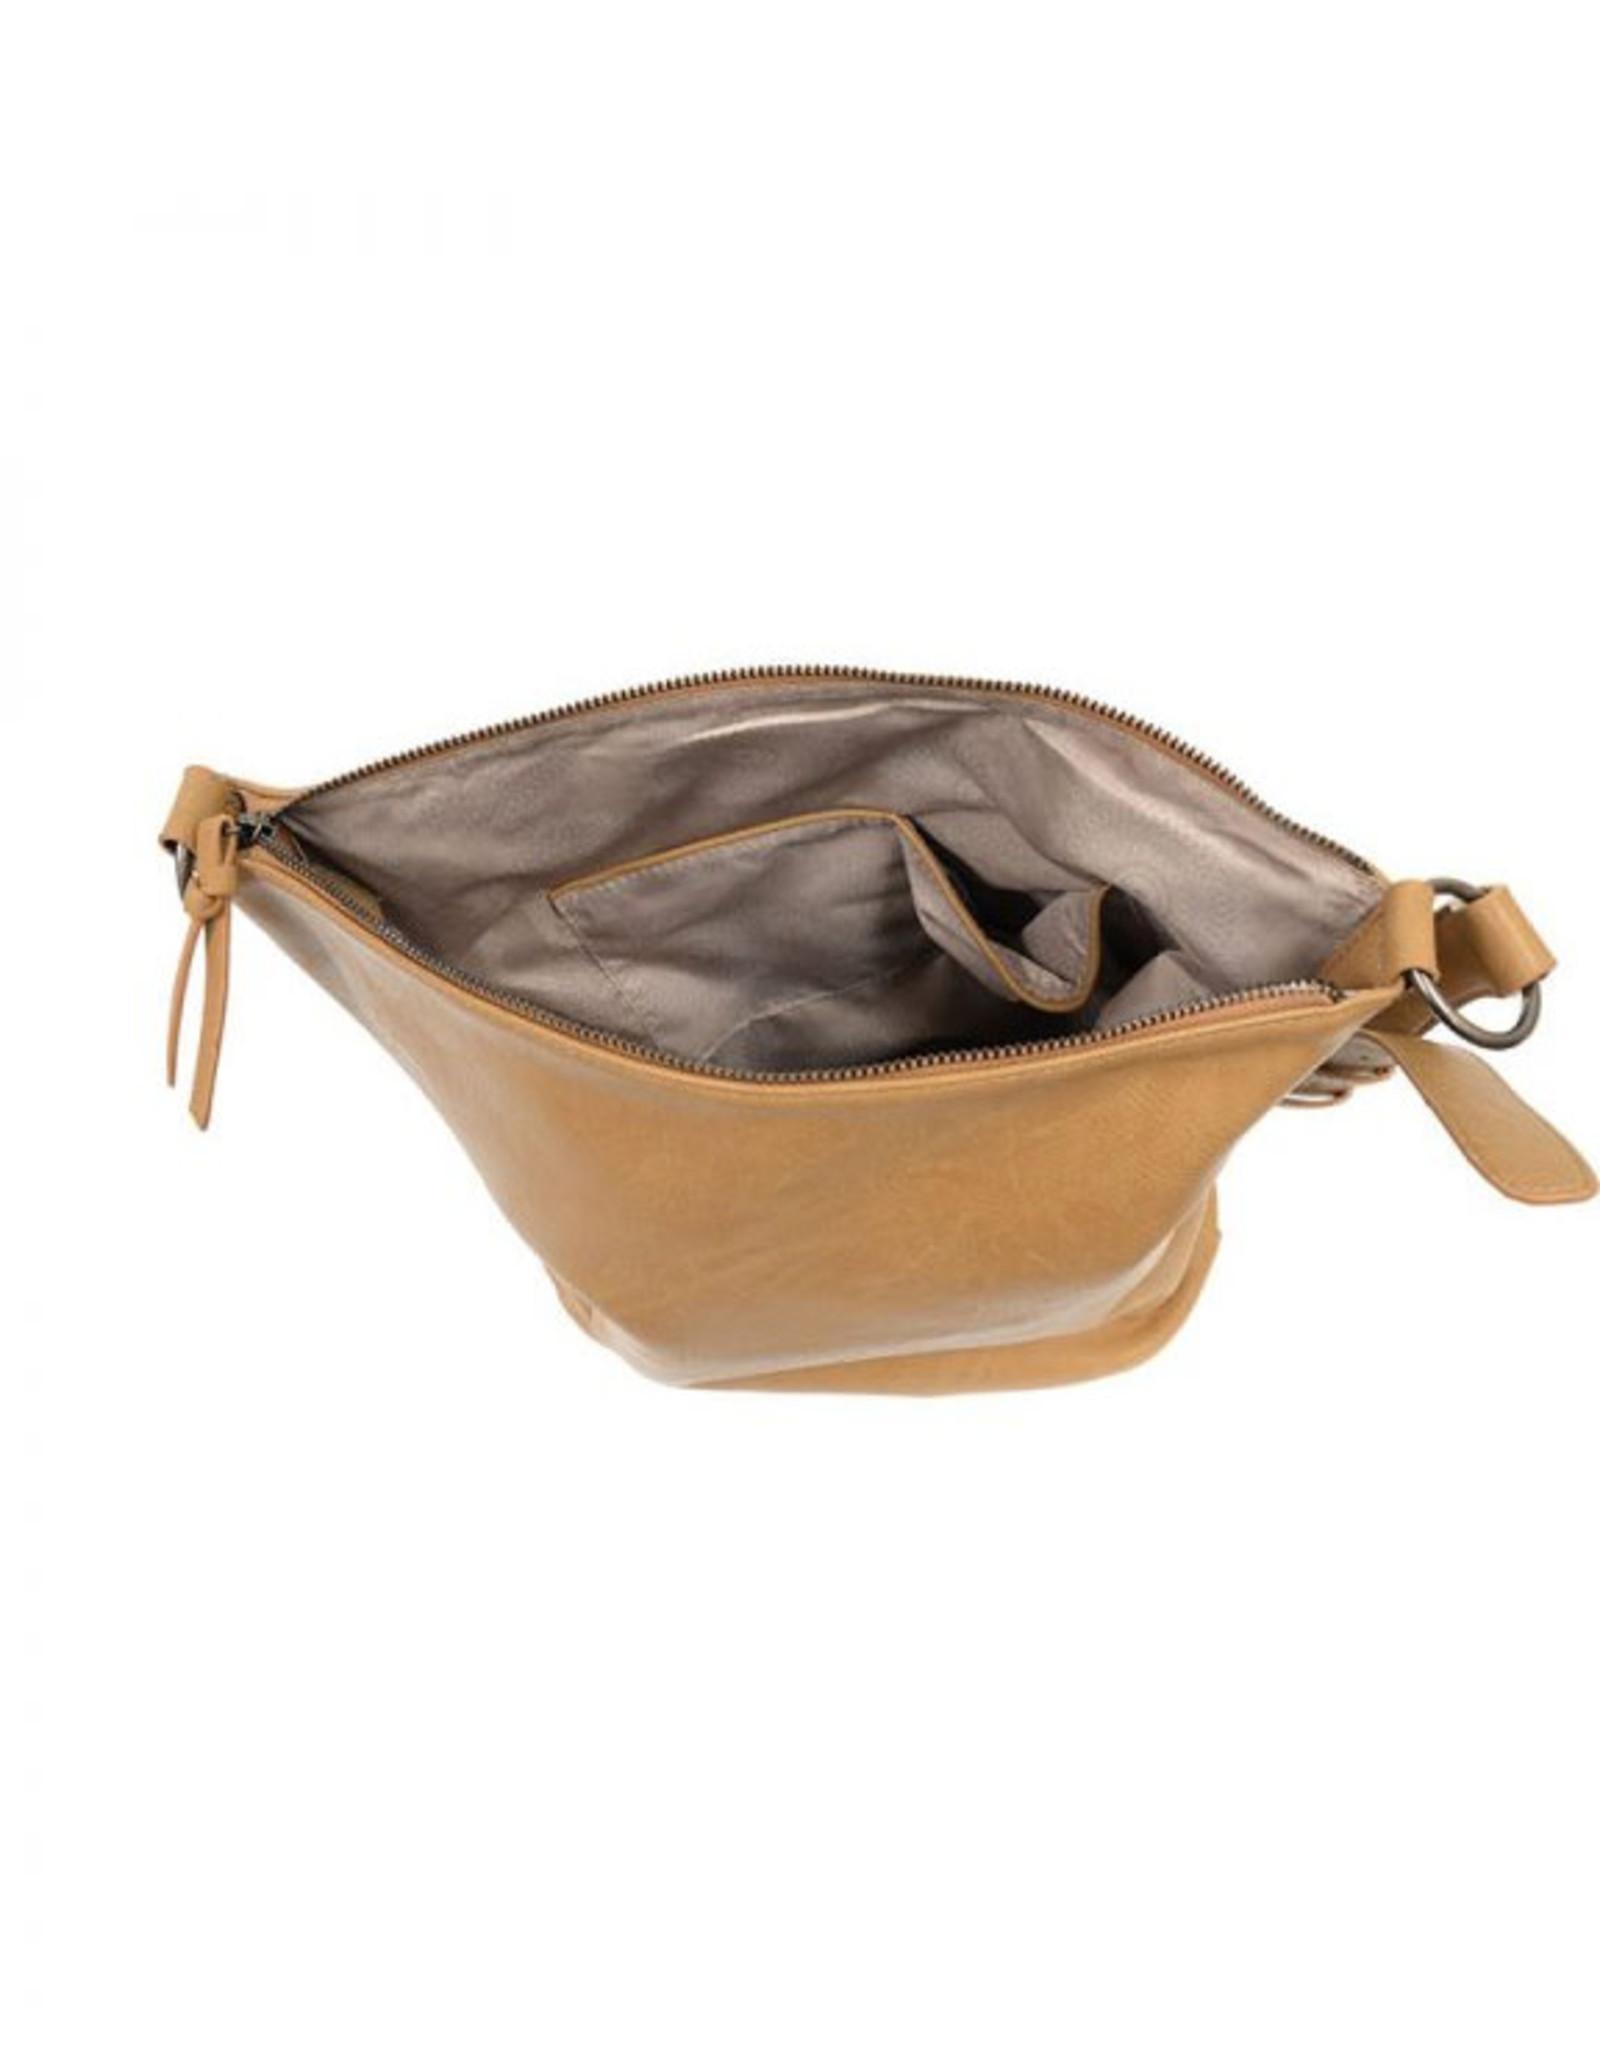 Joy Susan Nori Cross Body Bucket Bag